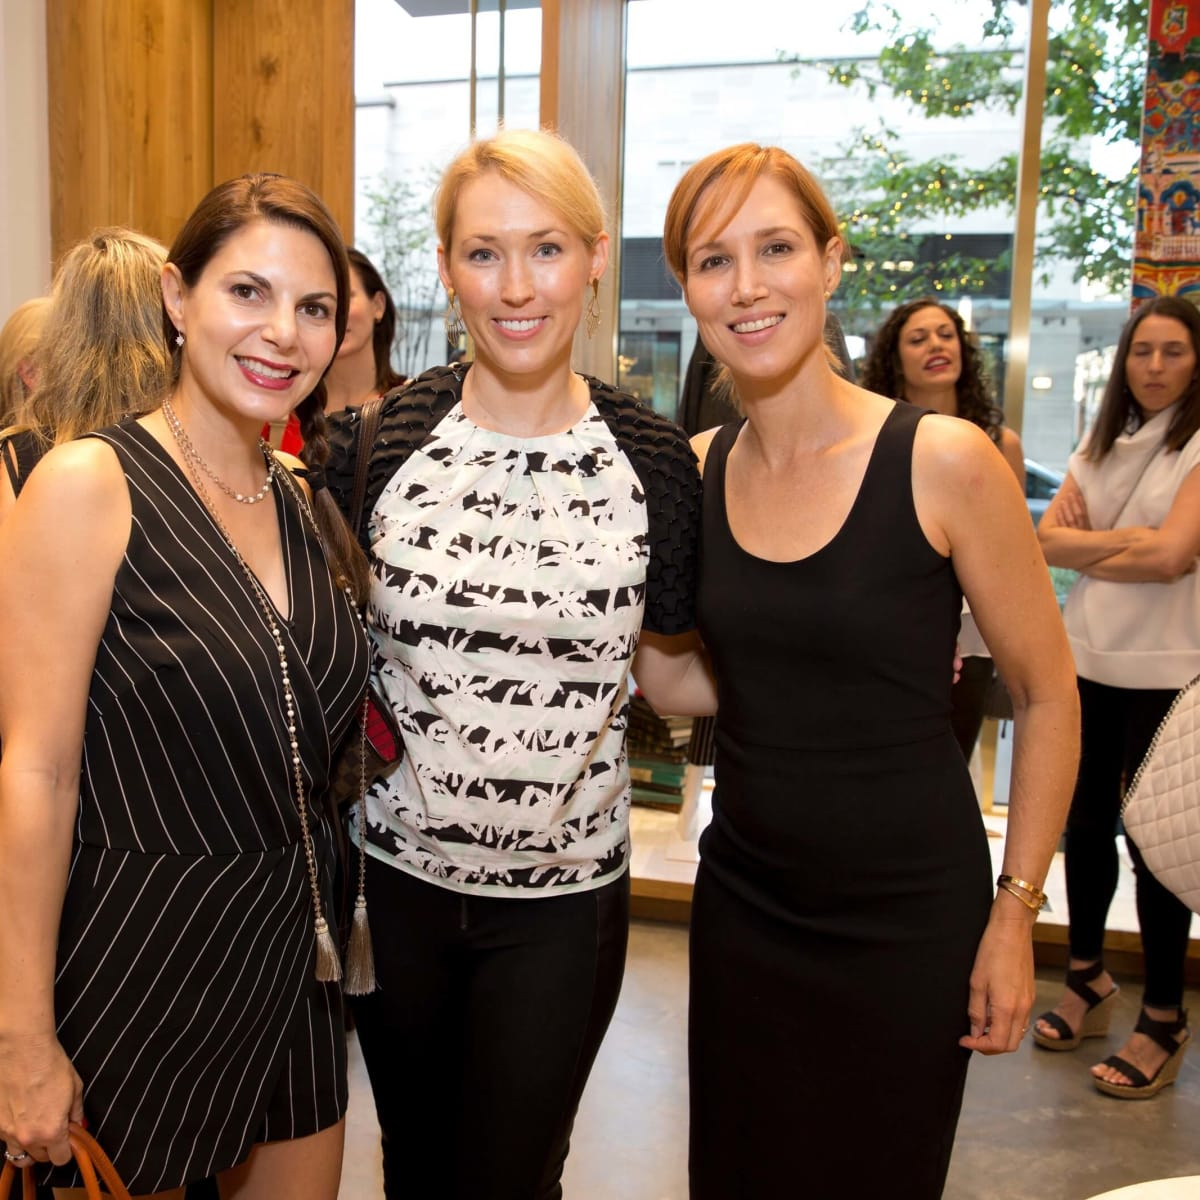 Alice and Olivia opening, 8/16, Kathy Mann, Karah Heim, Carolyn Dorros